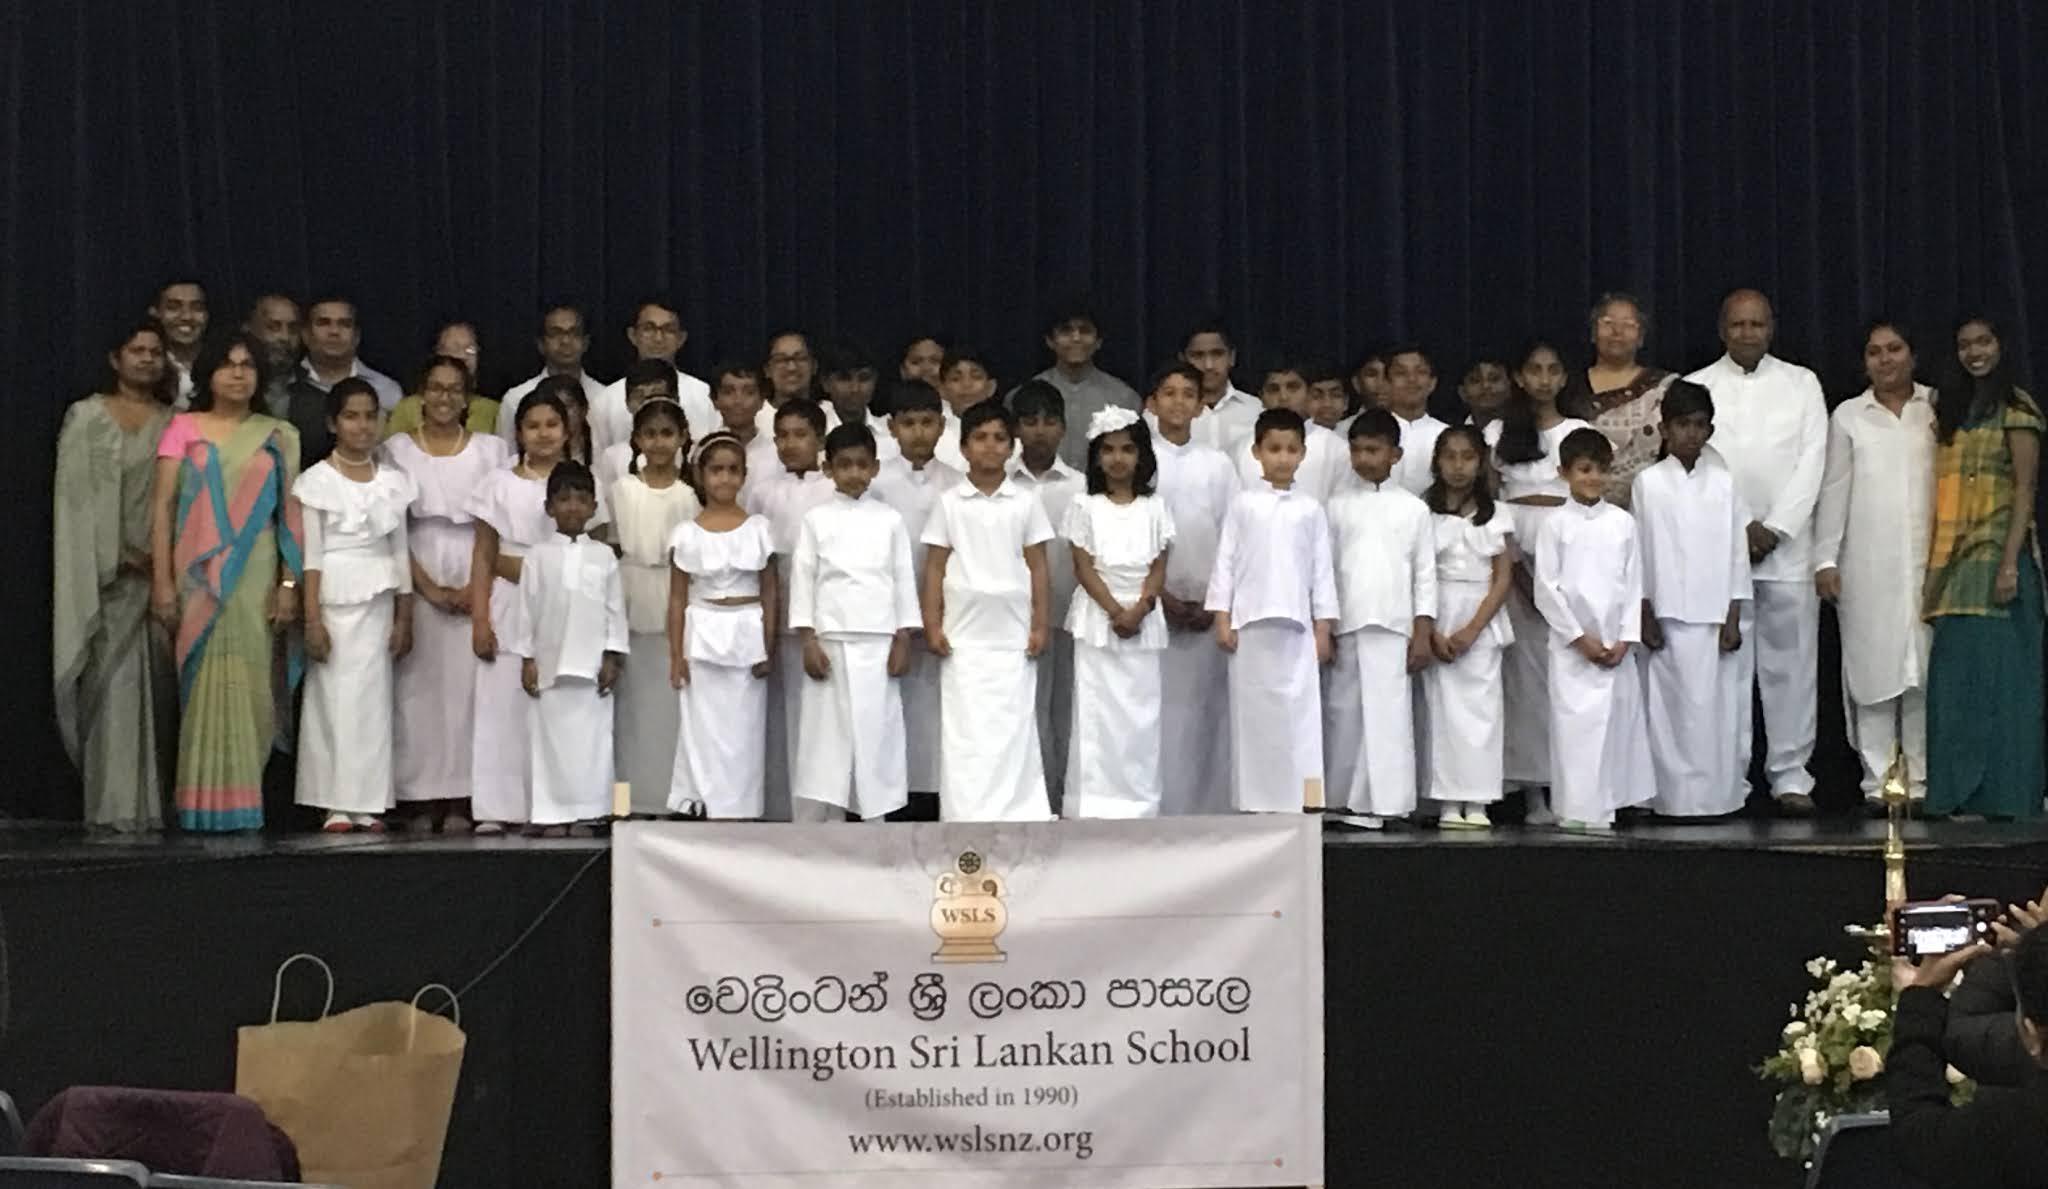 WELLINGTON SRI LANKAN SCHOOL (WSLS) CELEBRATES IT'S 30TH ANNIVERSARY by Gamini Settinayake